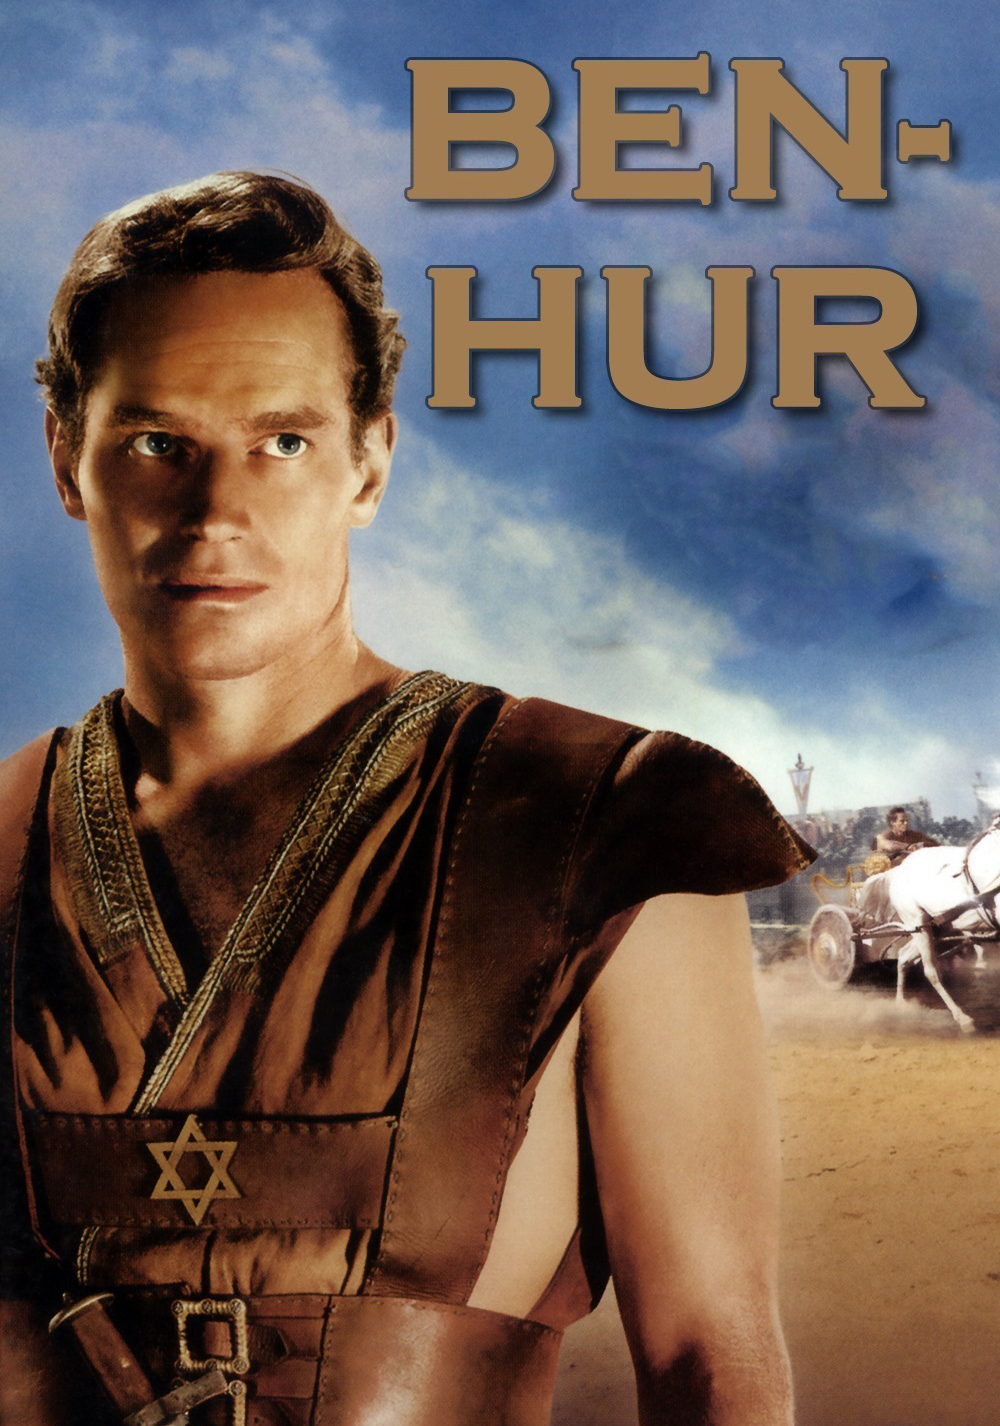 Ben-Hur [1925-1959] [DVD9 + DVD5] [NTSC] [Latino] [4DISC]